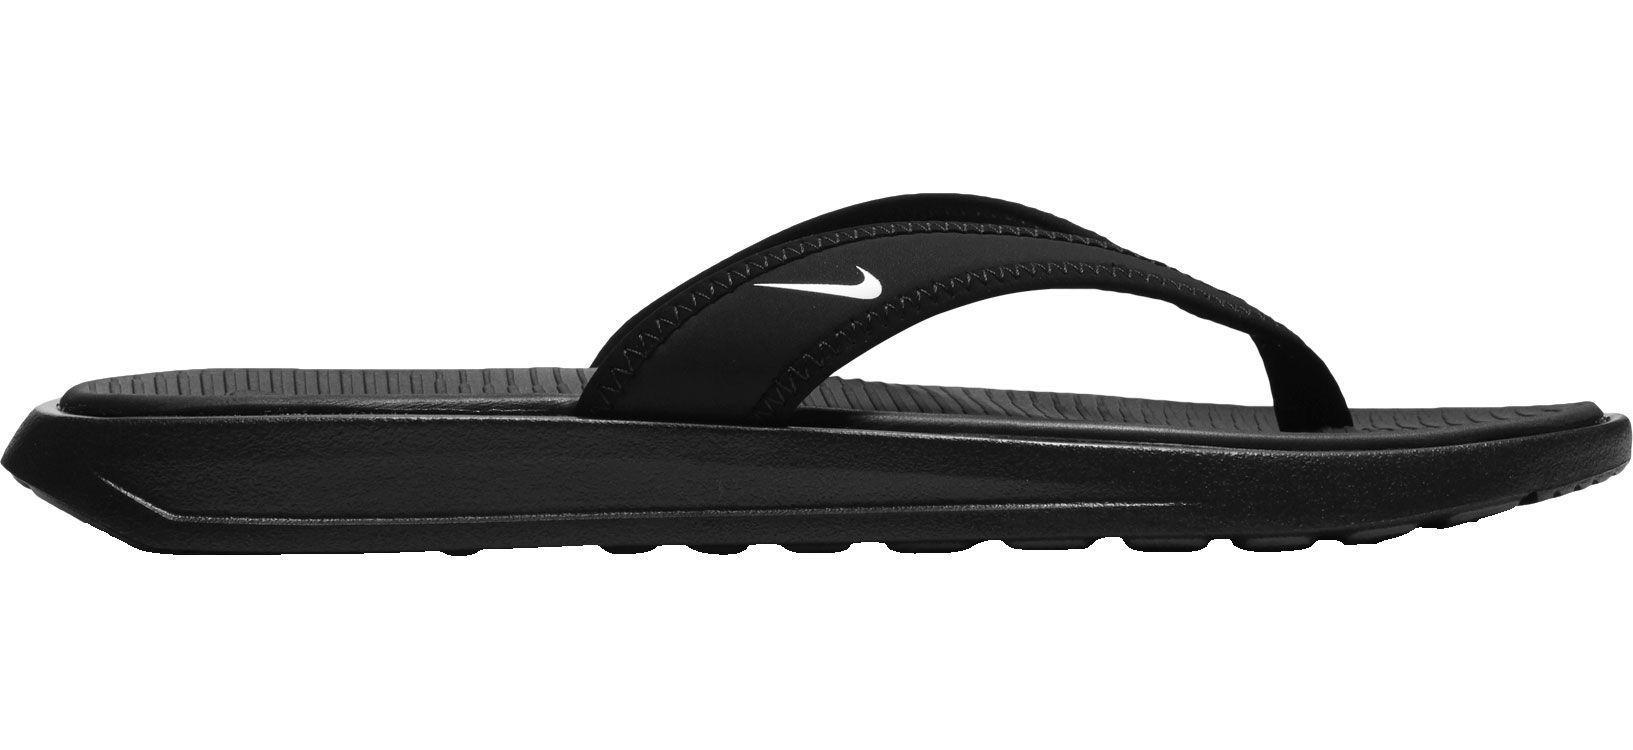 promo code 8fd9a 1af6e Nike Women's Celso Ultra Thong Flip Flops